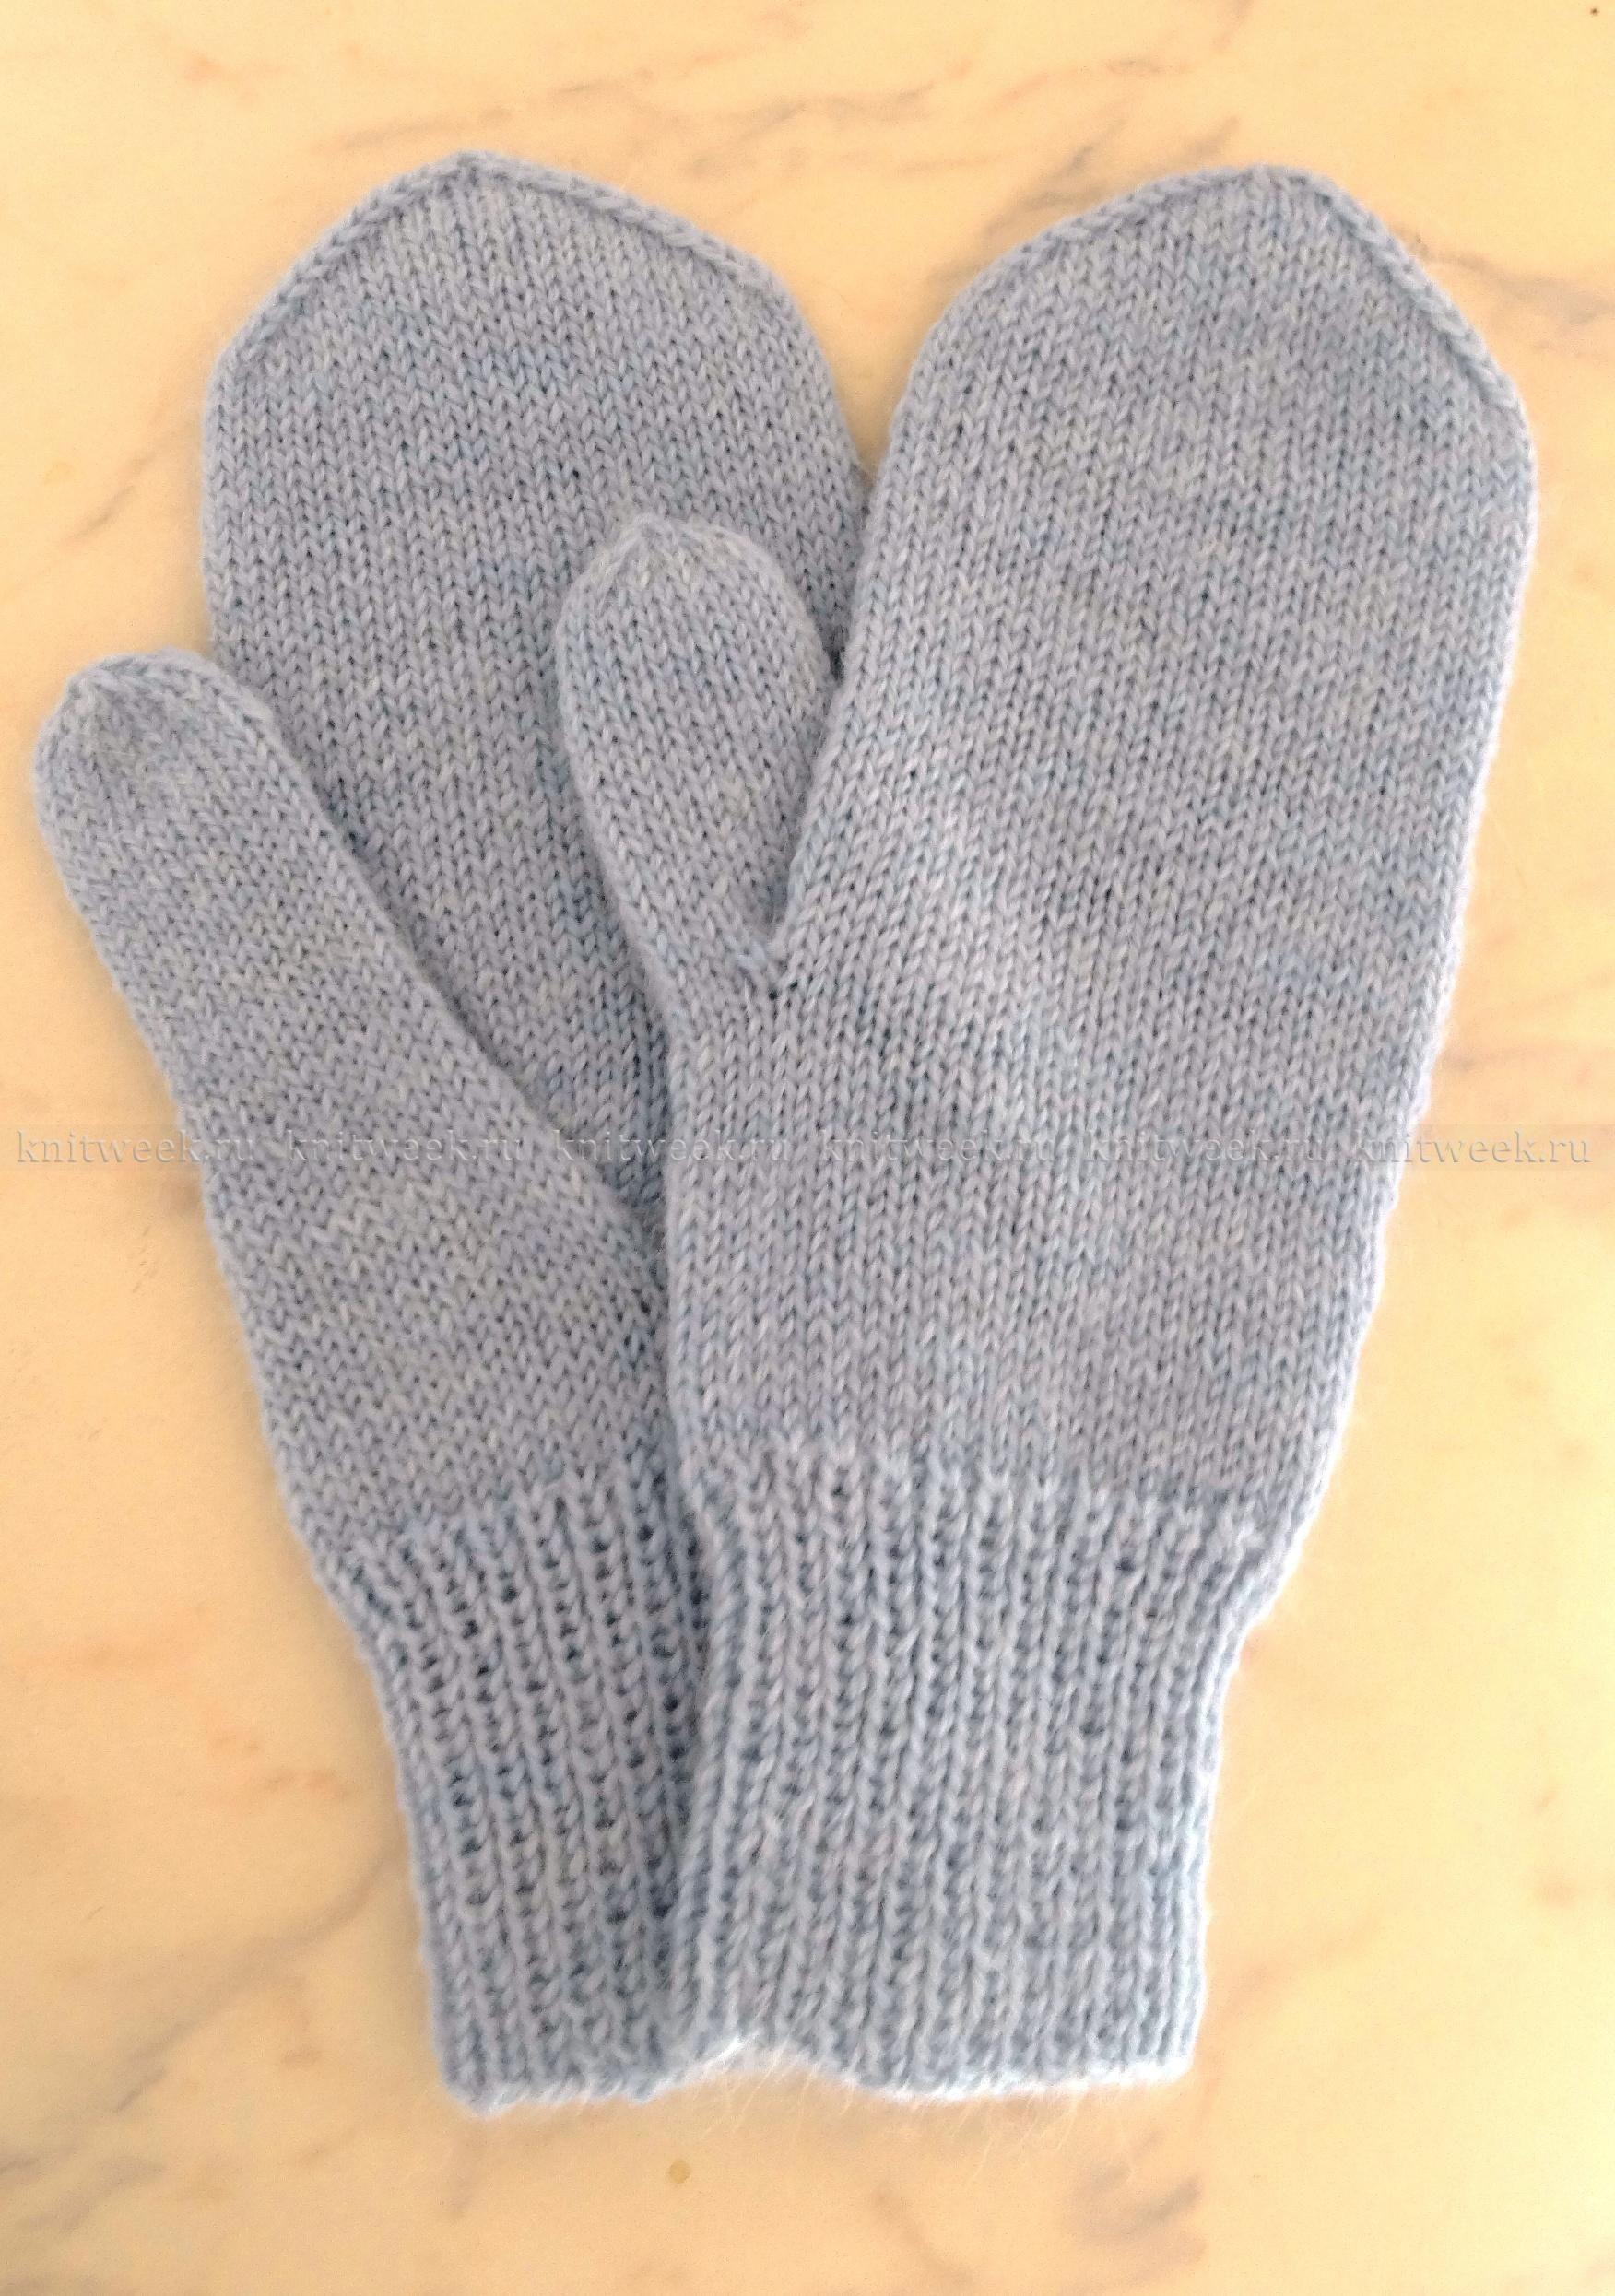 Варежки с анатомическим пальцем | Варежки | Pinterest